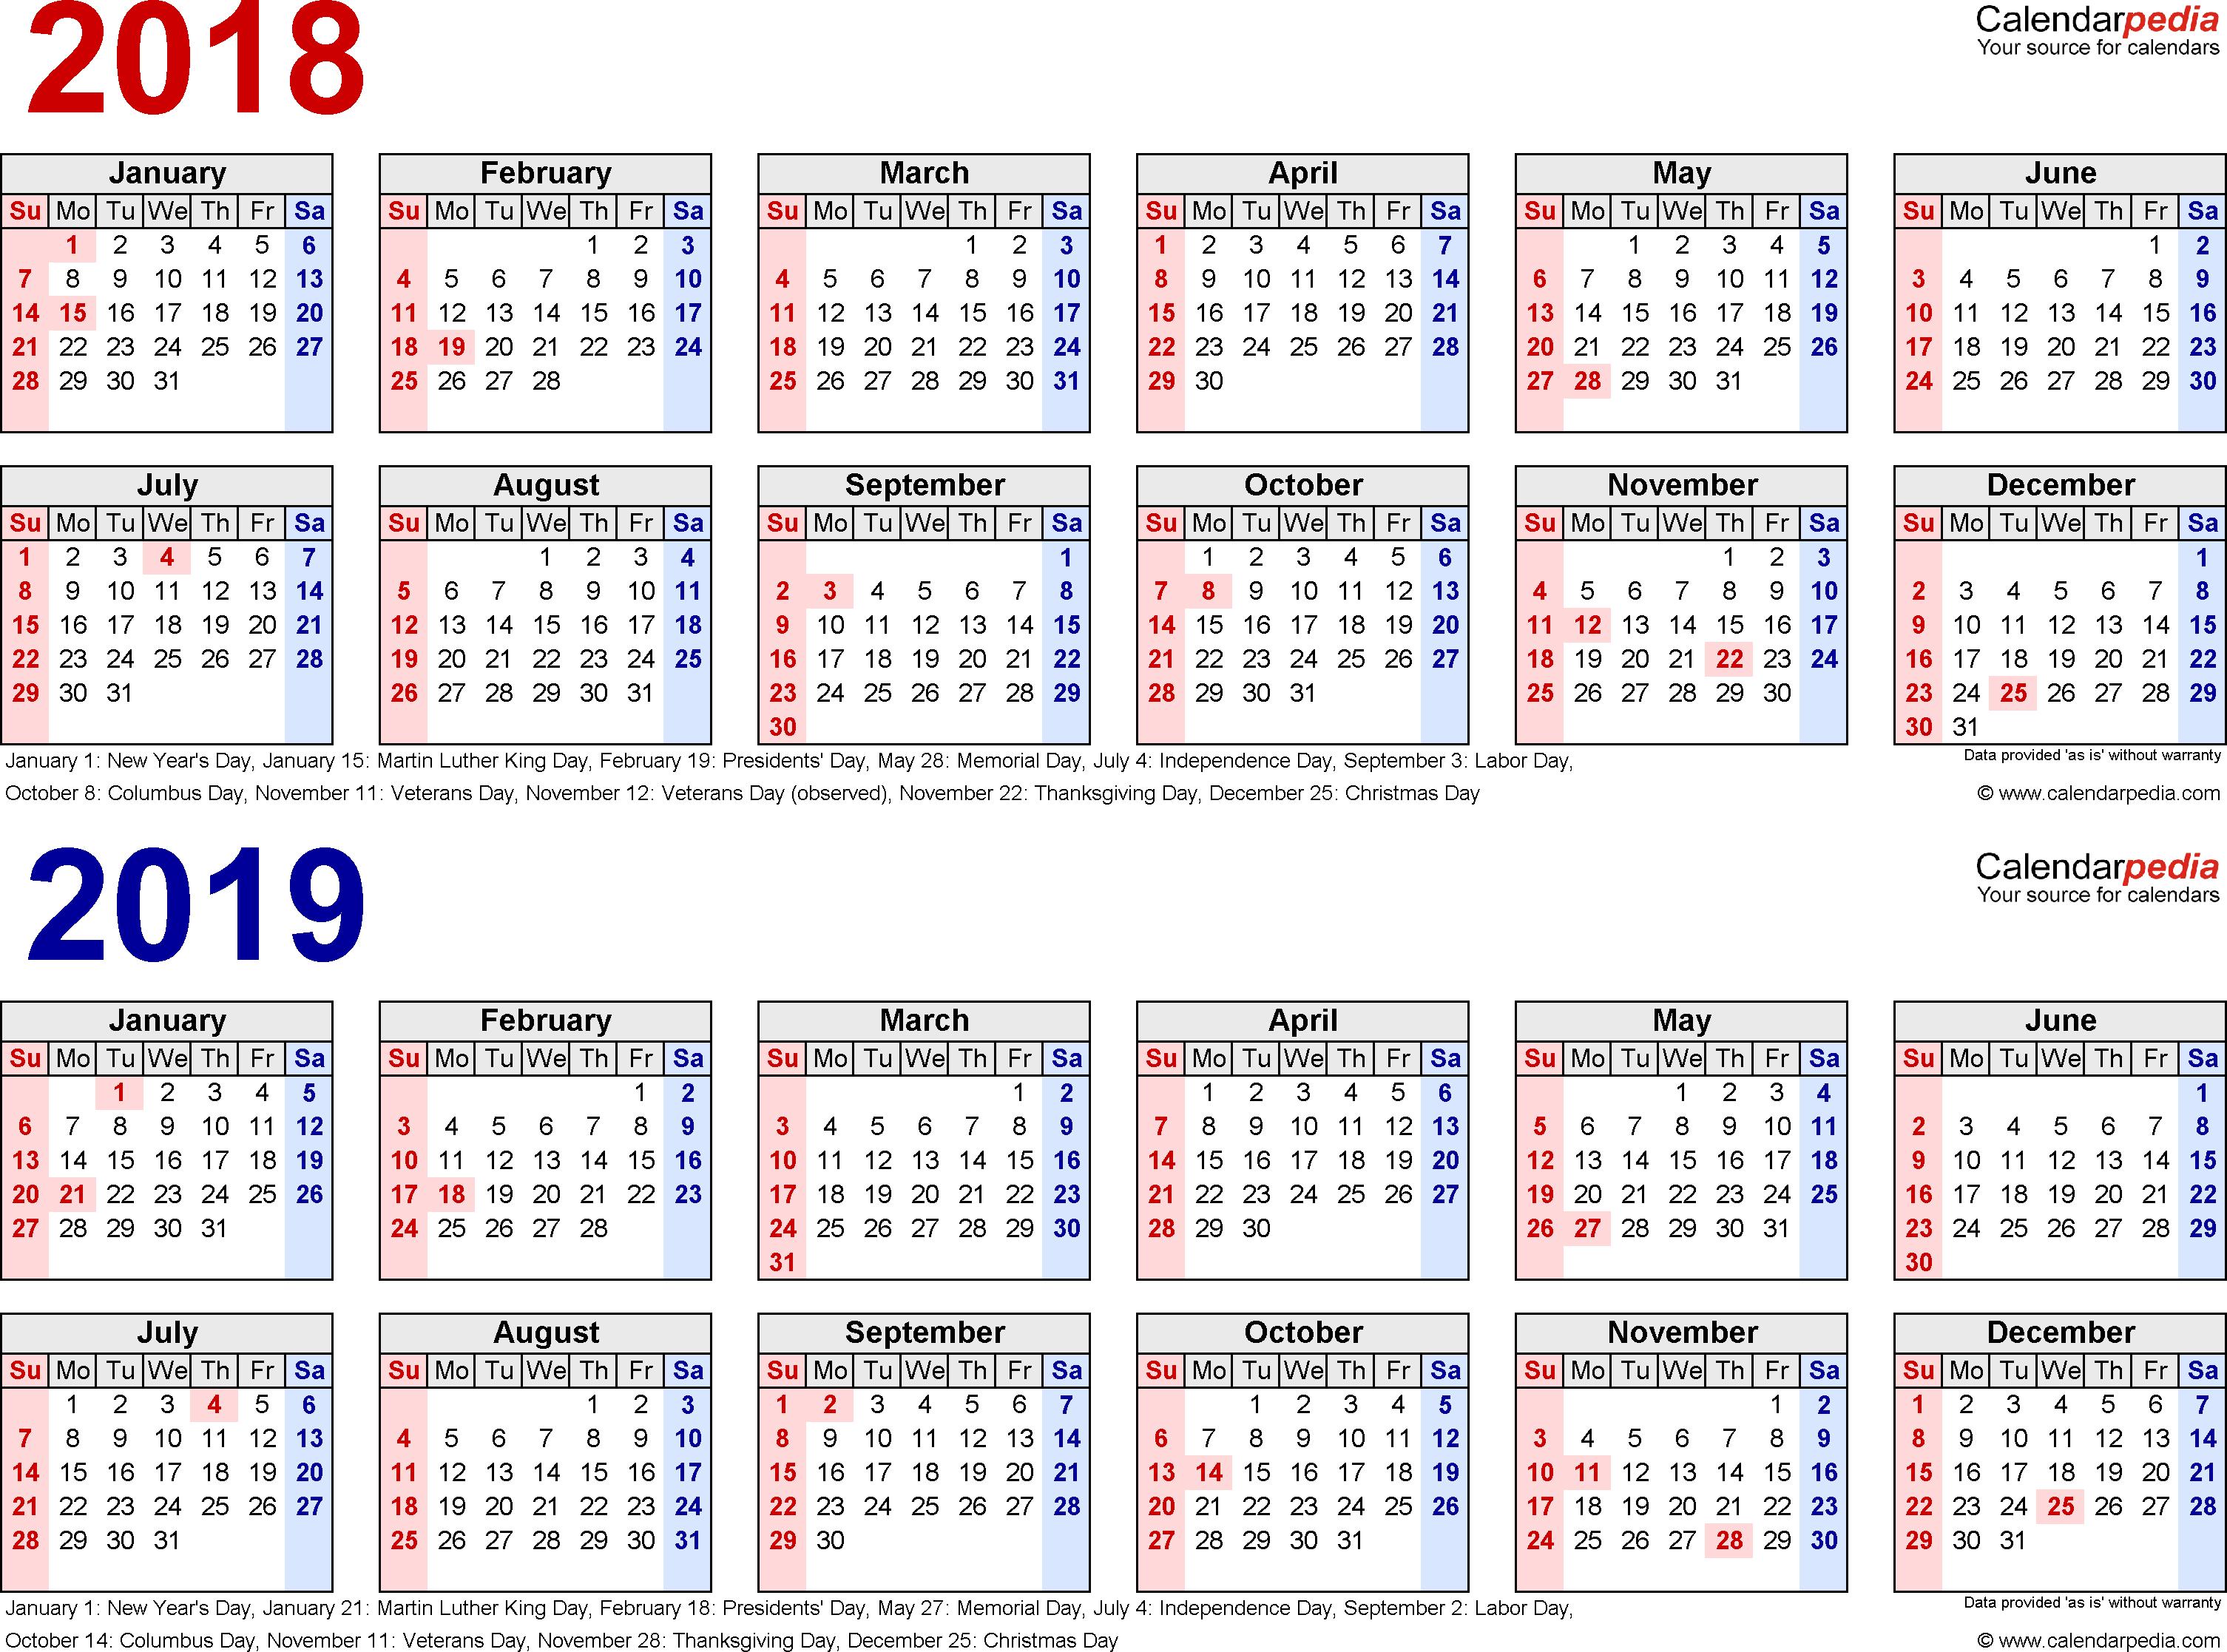 Uc Payroll Calendar 2018 | Payroll Calendars regarding Uc Berkeley Payroll Calendar 2020